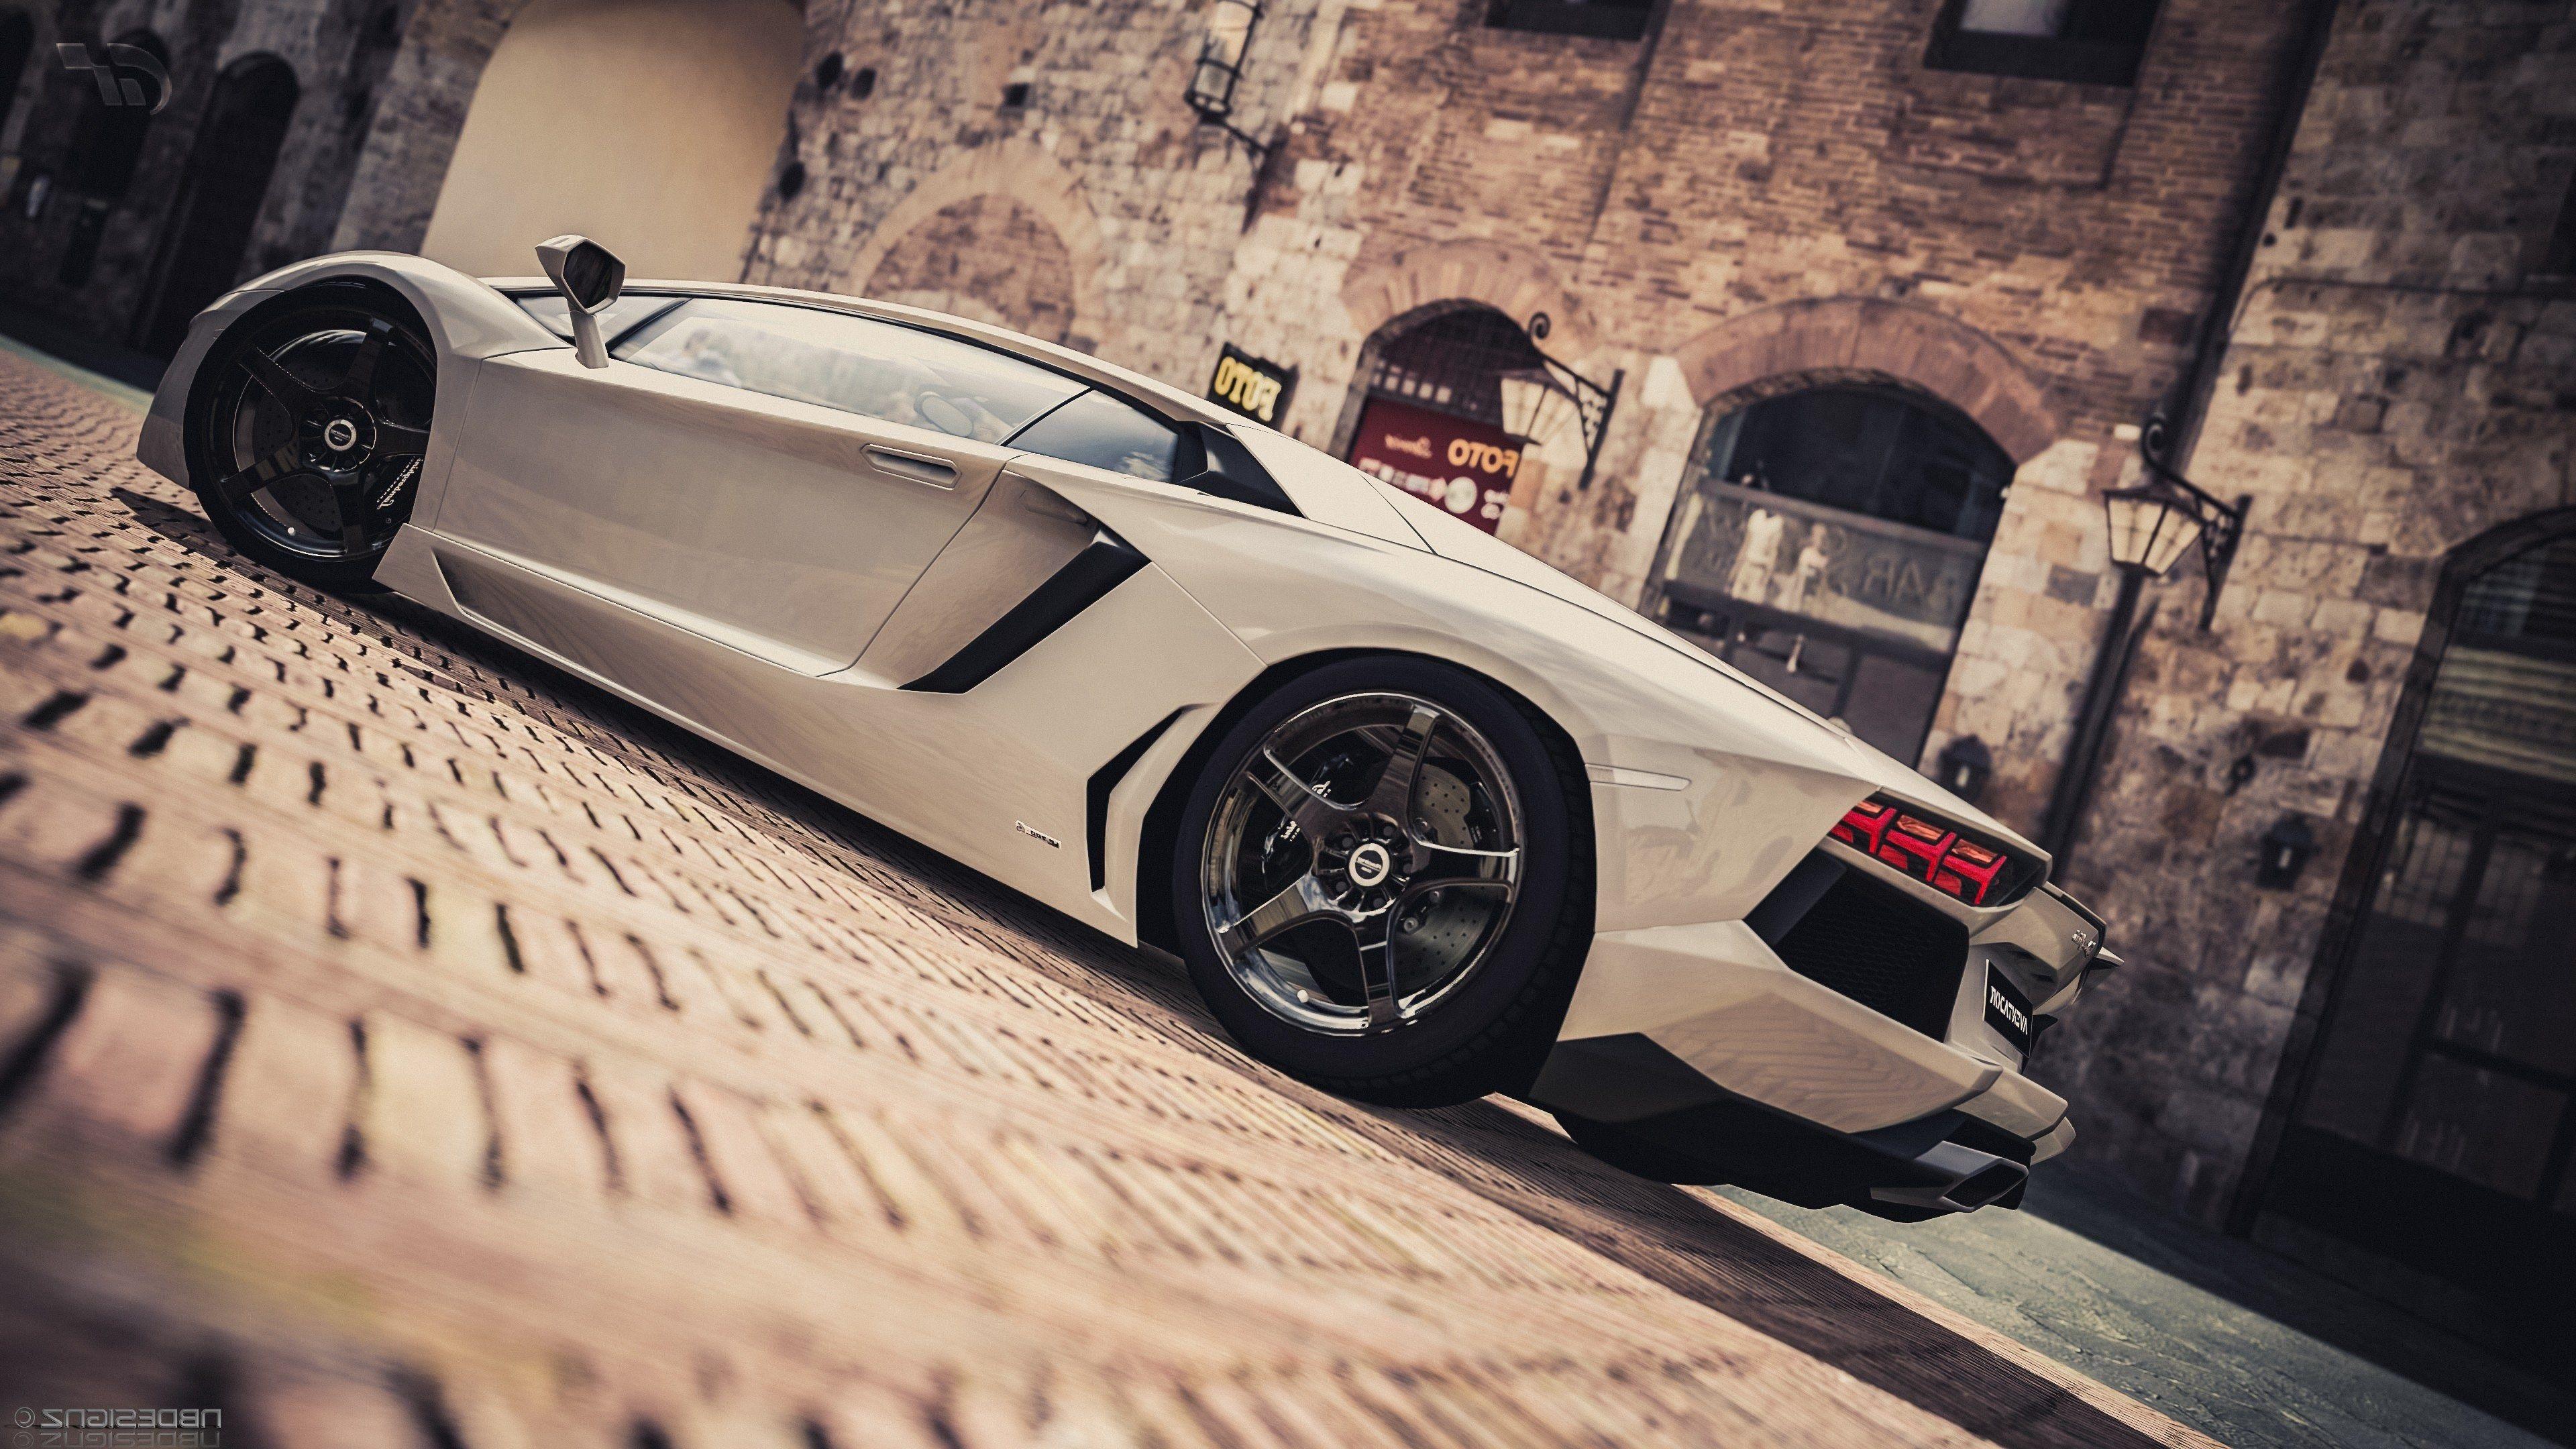 3840x2160 Lamborghini 4k Download Hd Wallpaper For Pc Lamborghini Aventador Wallpaper Lamborghini Aventador Lamborghini